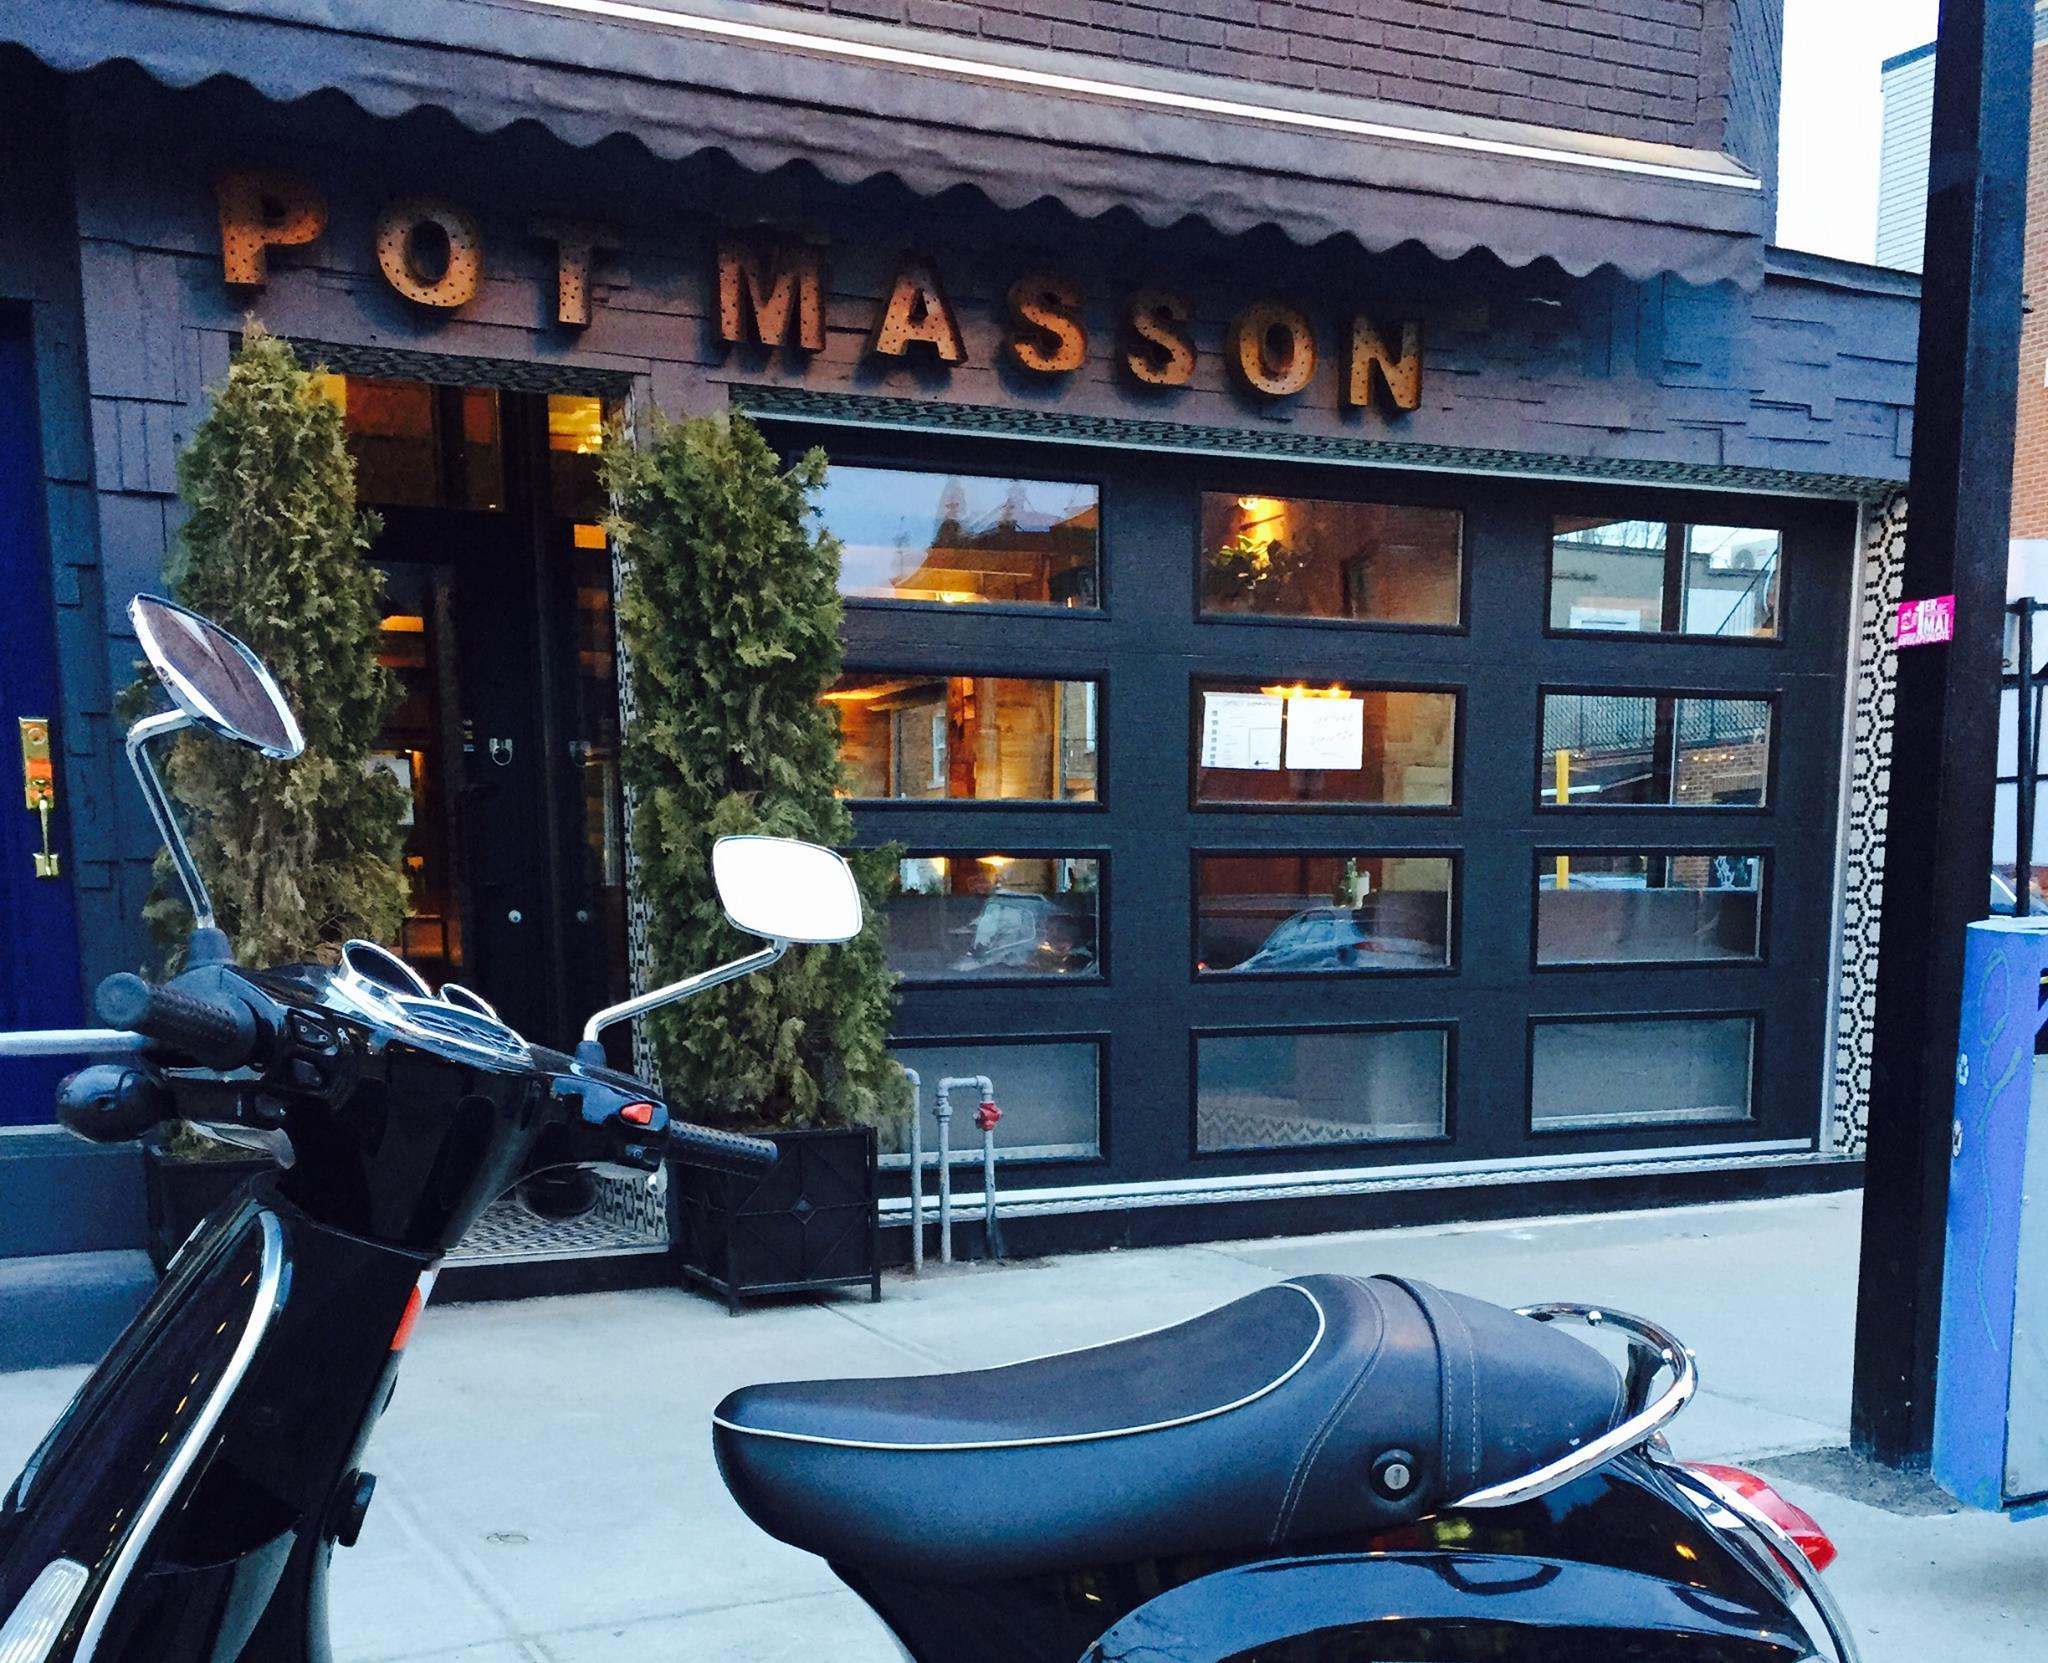 Outside the new Pot Masson